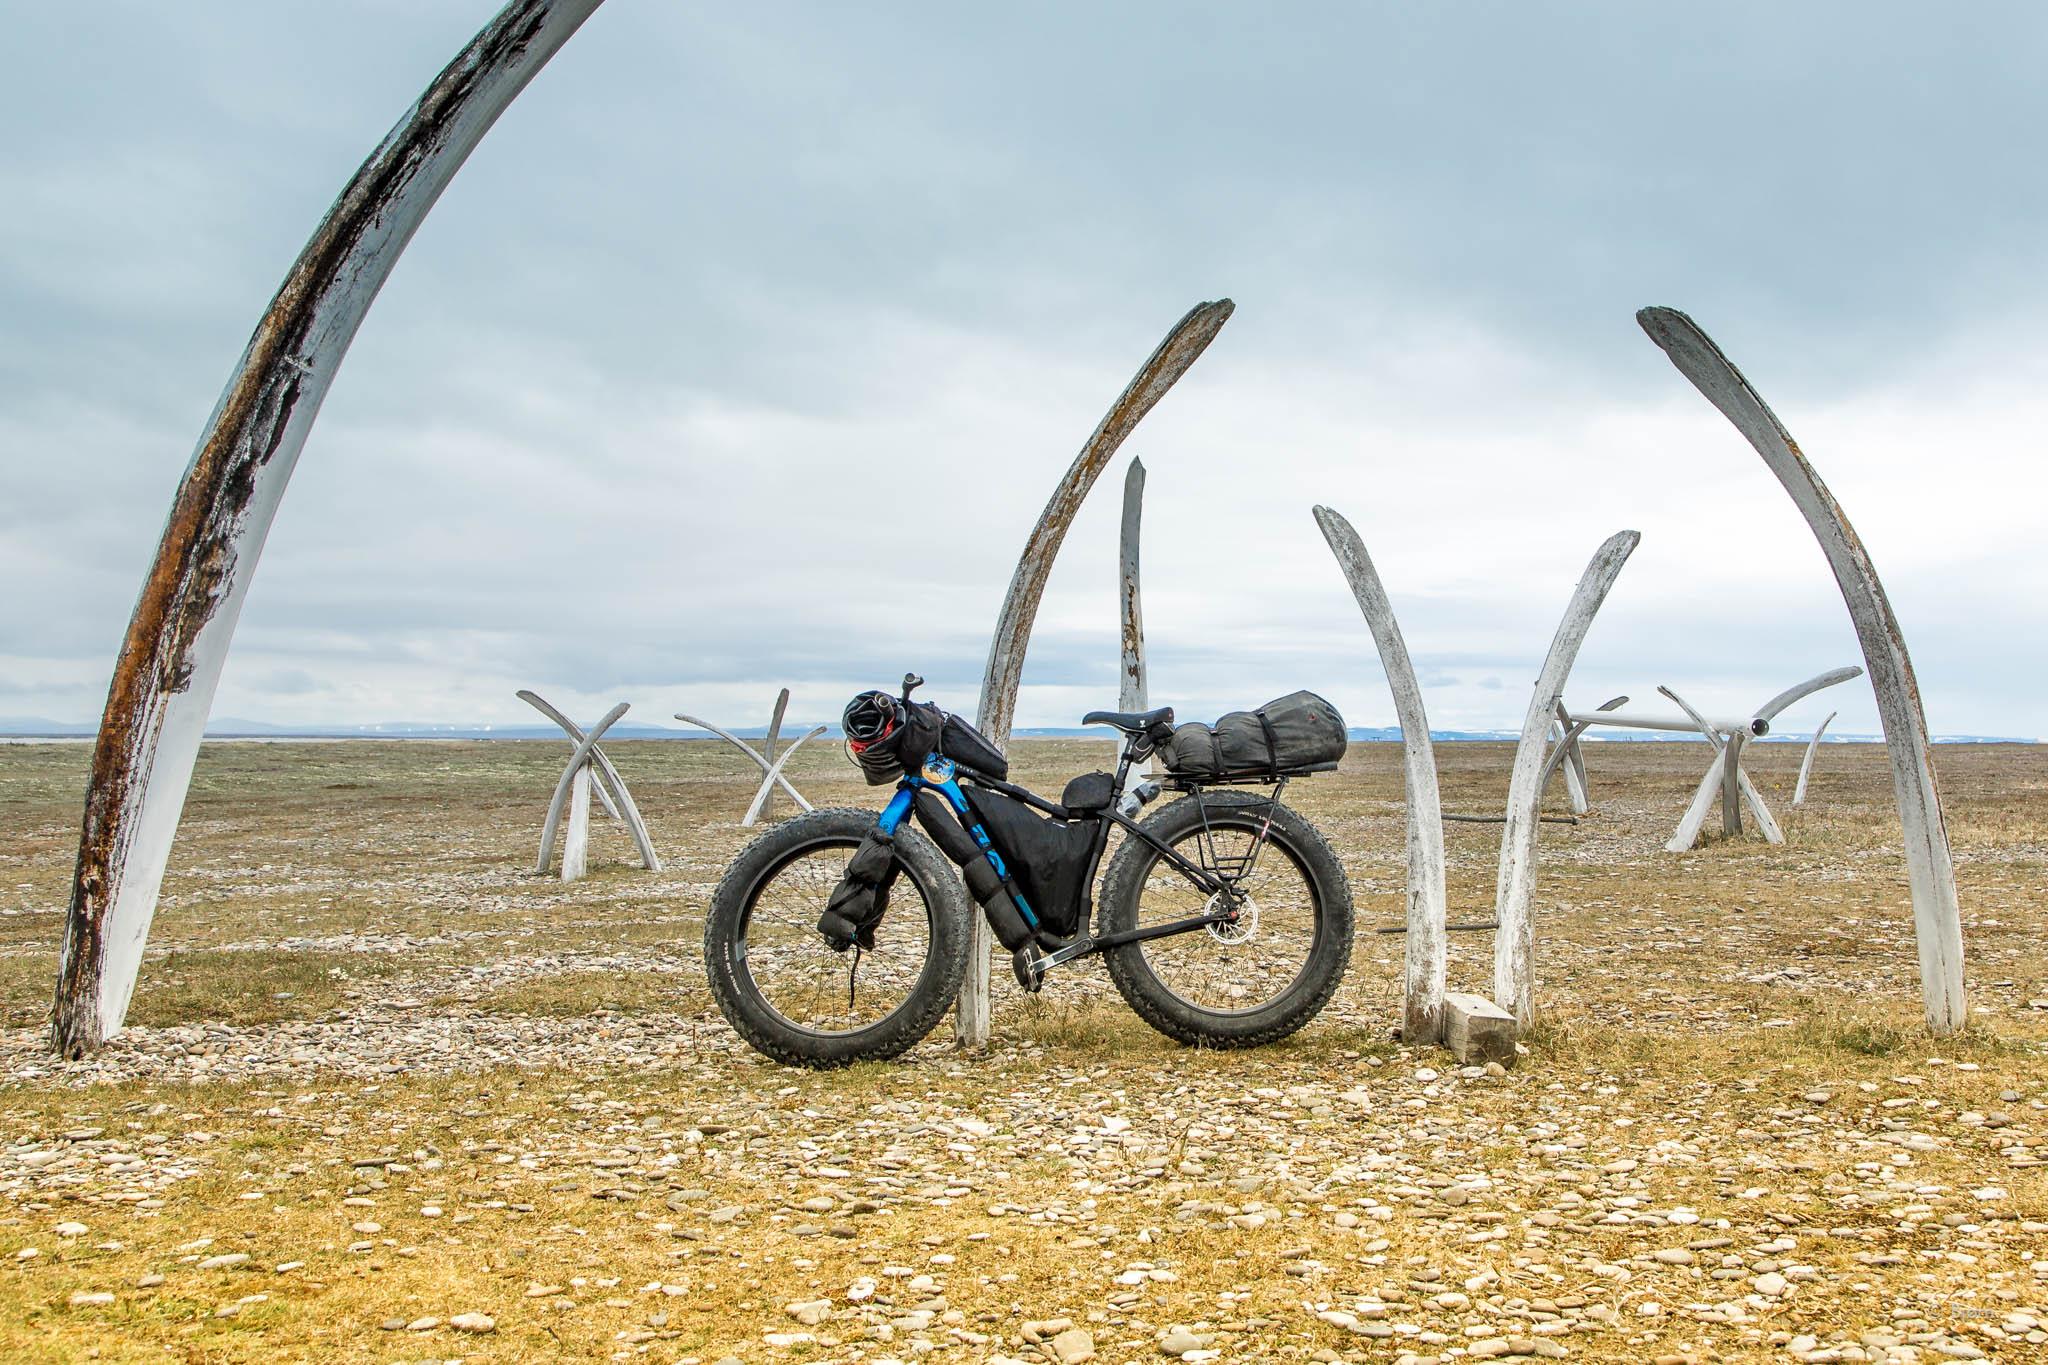 Salsa Mukluk fat-bike in front of whale bones - Point Hope, Alaska.